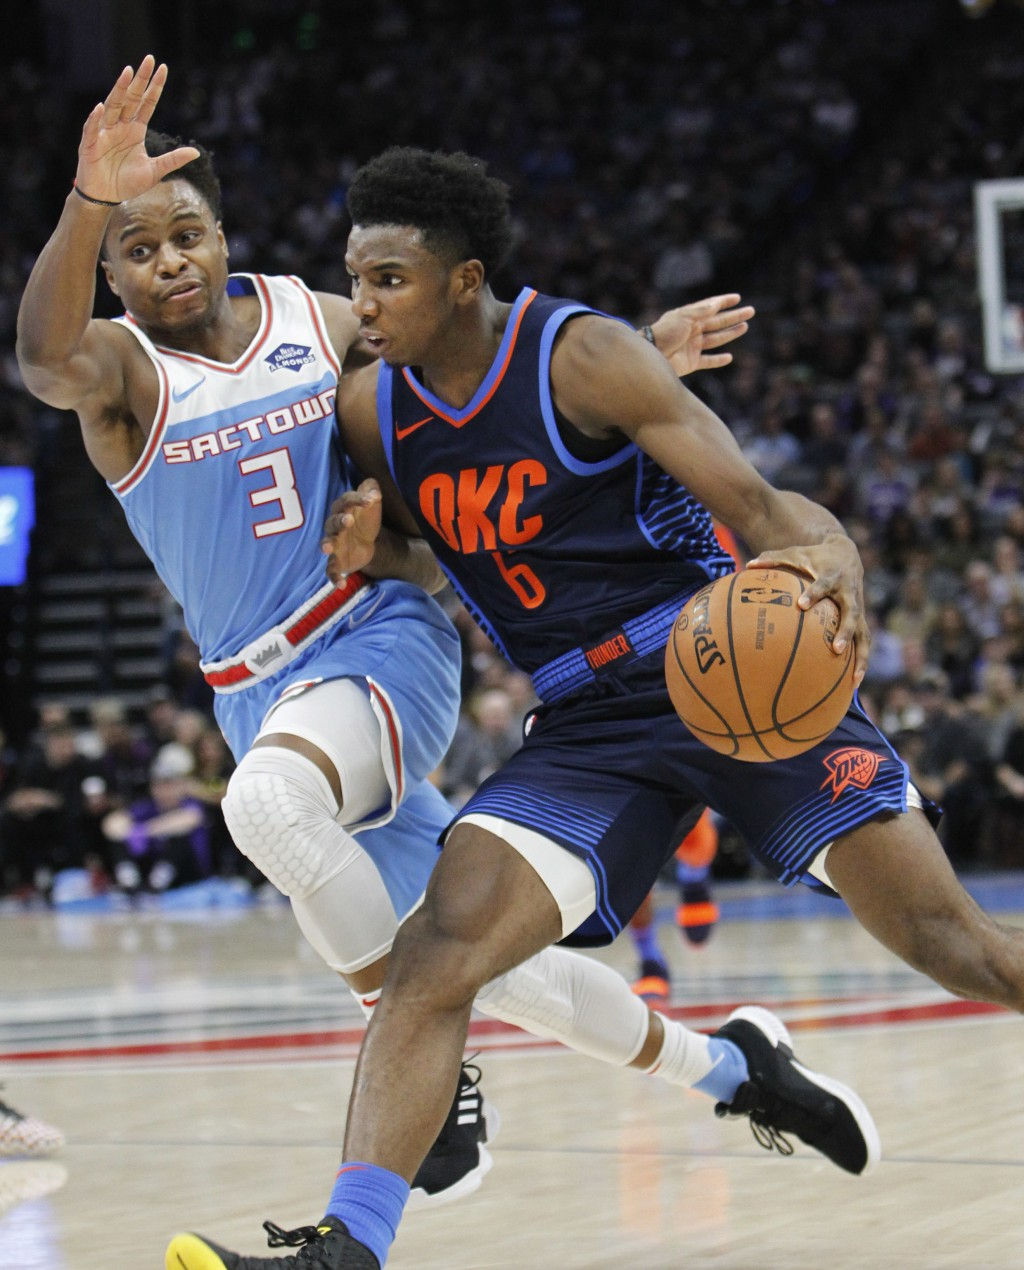 Oklahoma City Thunder guard Hamidou Diallo (6) drives to the basket against Sacramento Kings guard Yogi Ferrell (3) during the first half of an NBA ba